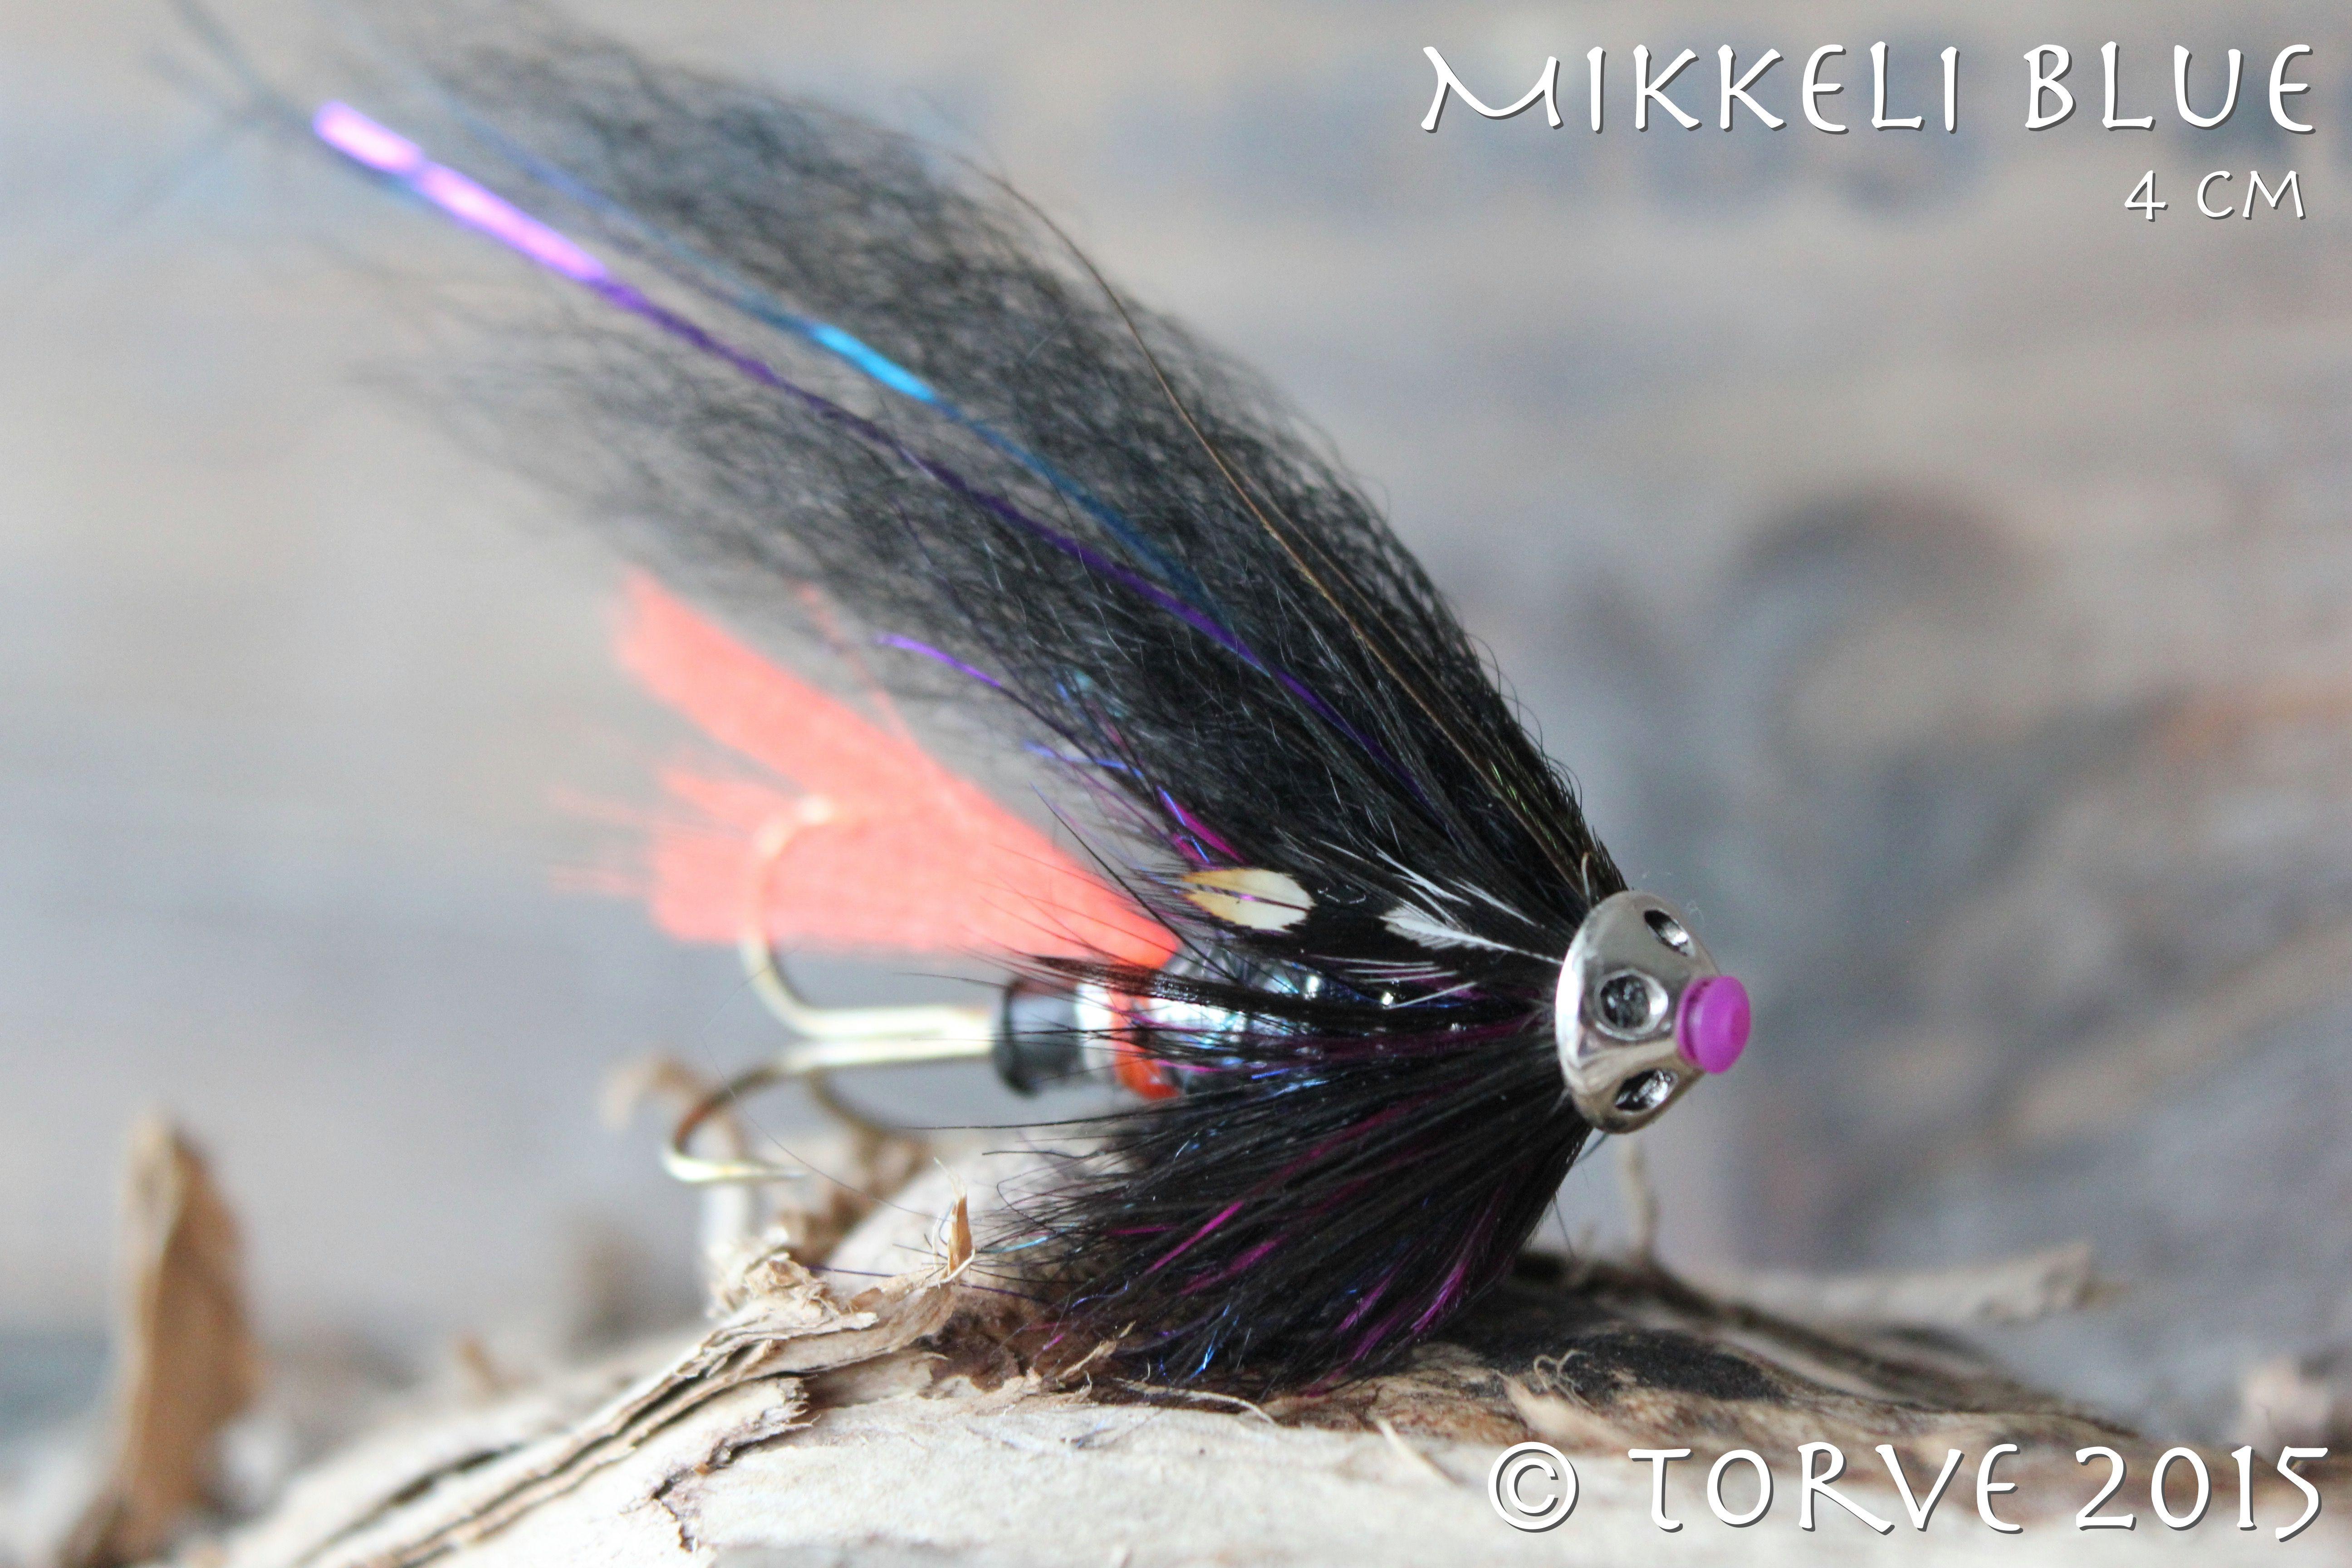 Mikkeli Blue Salmon Fly 4 Cm Tied By Torve Salmon Fishing Salmon